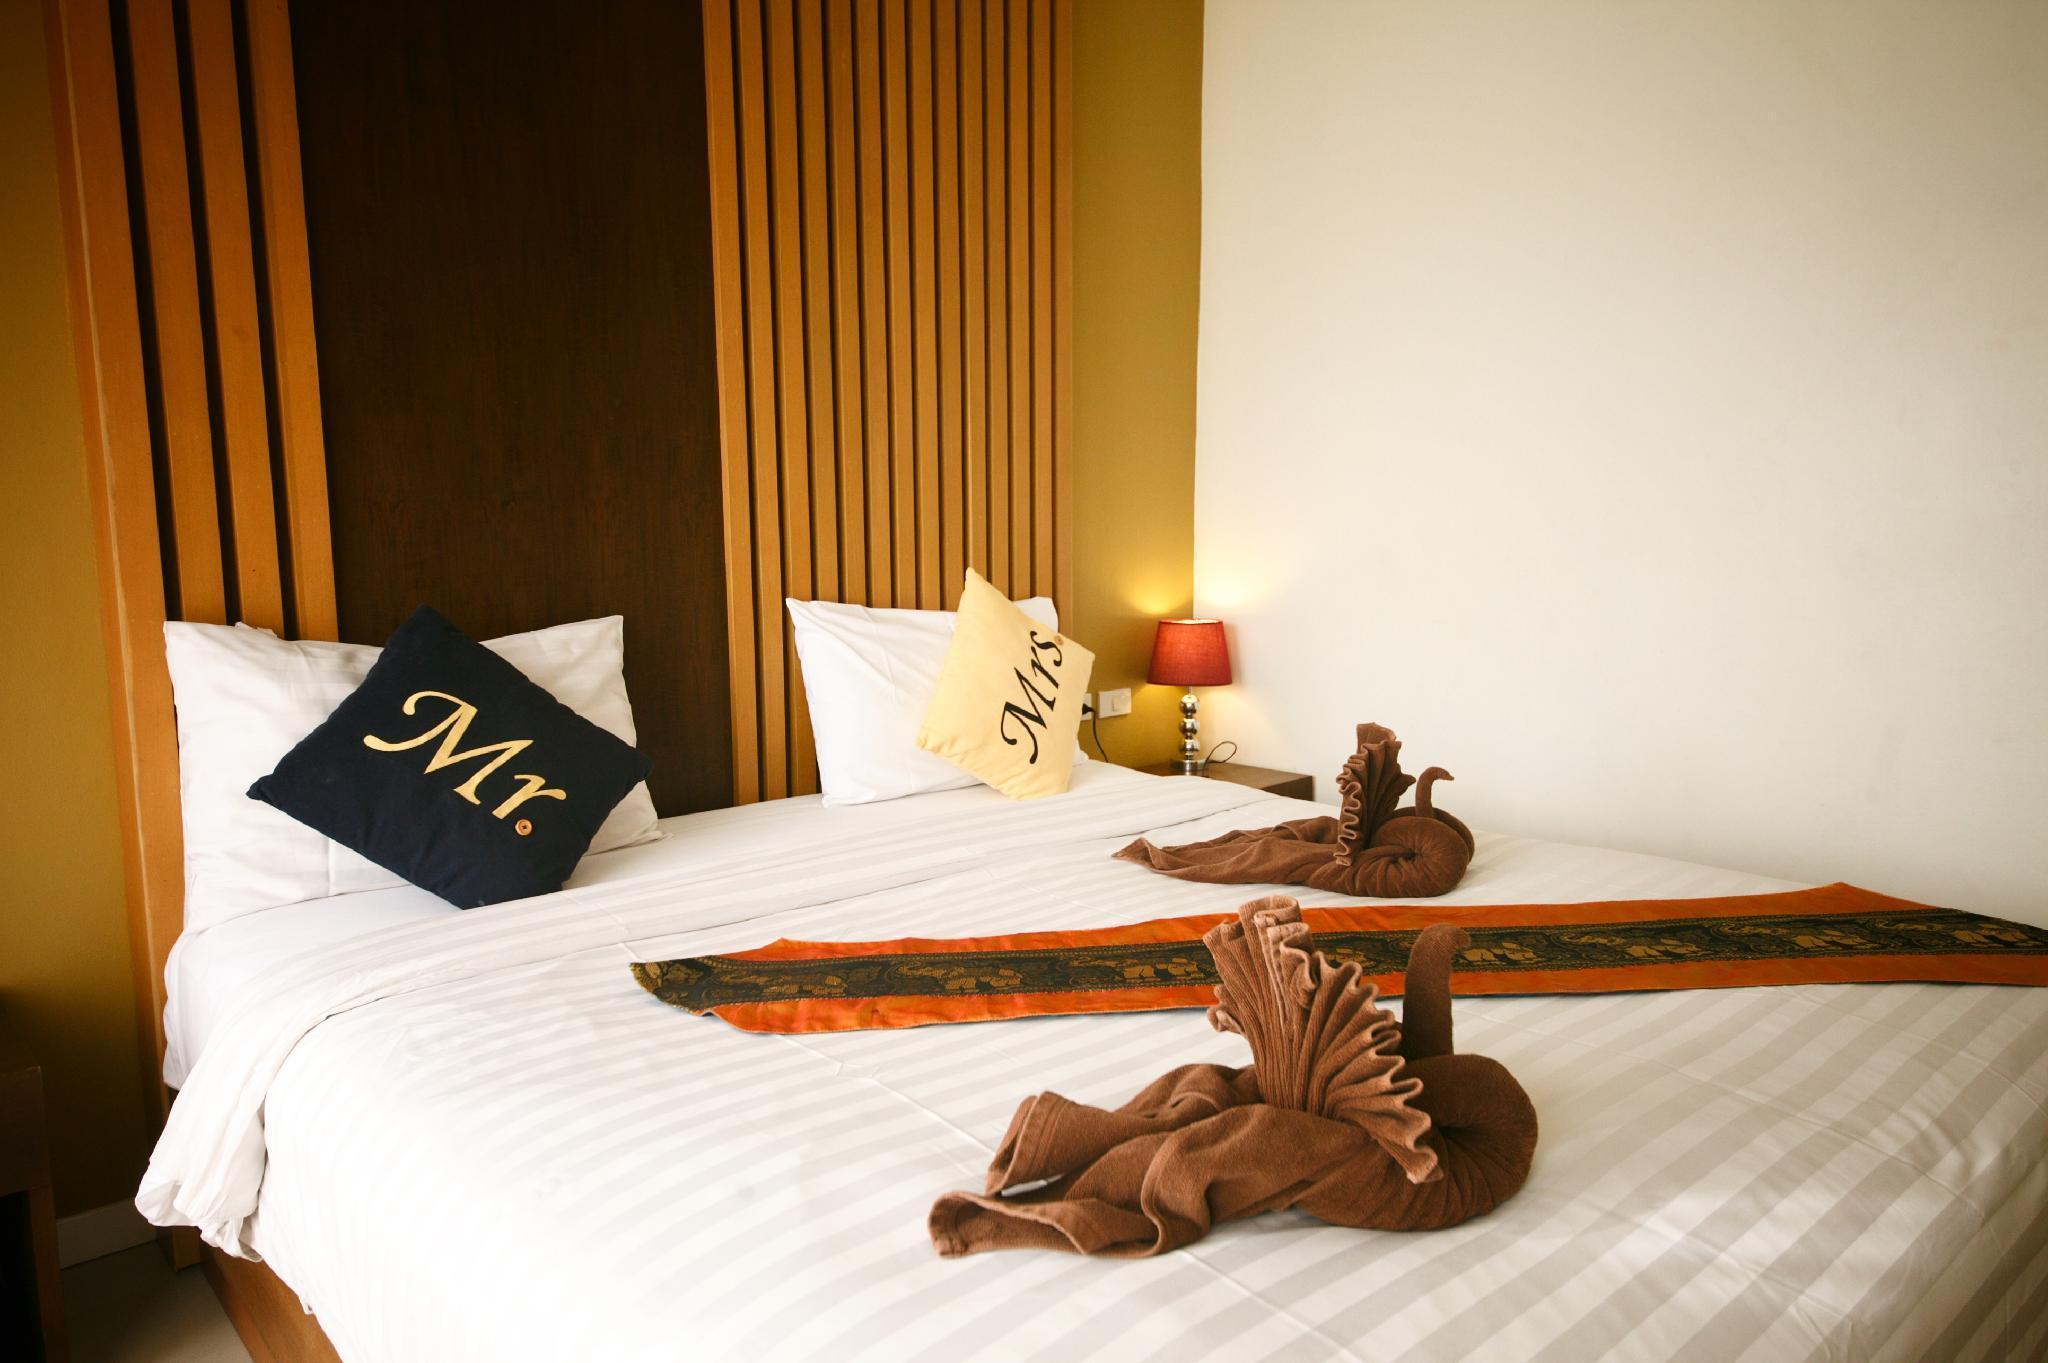 Dream Phuket Hotel ดรีม ภูเก็ต โฮเต็ล